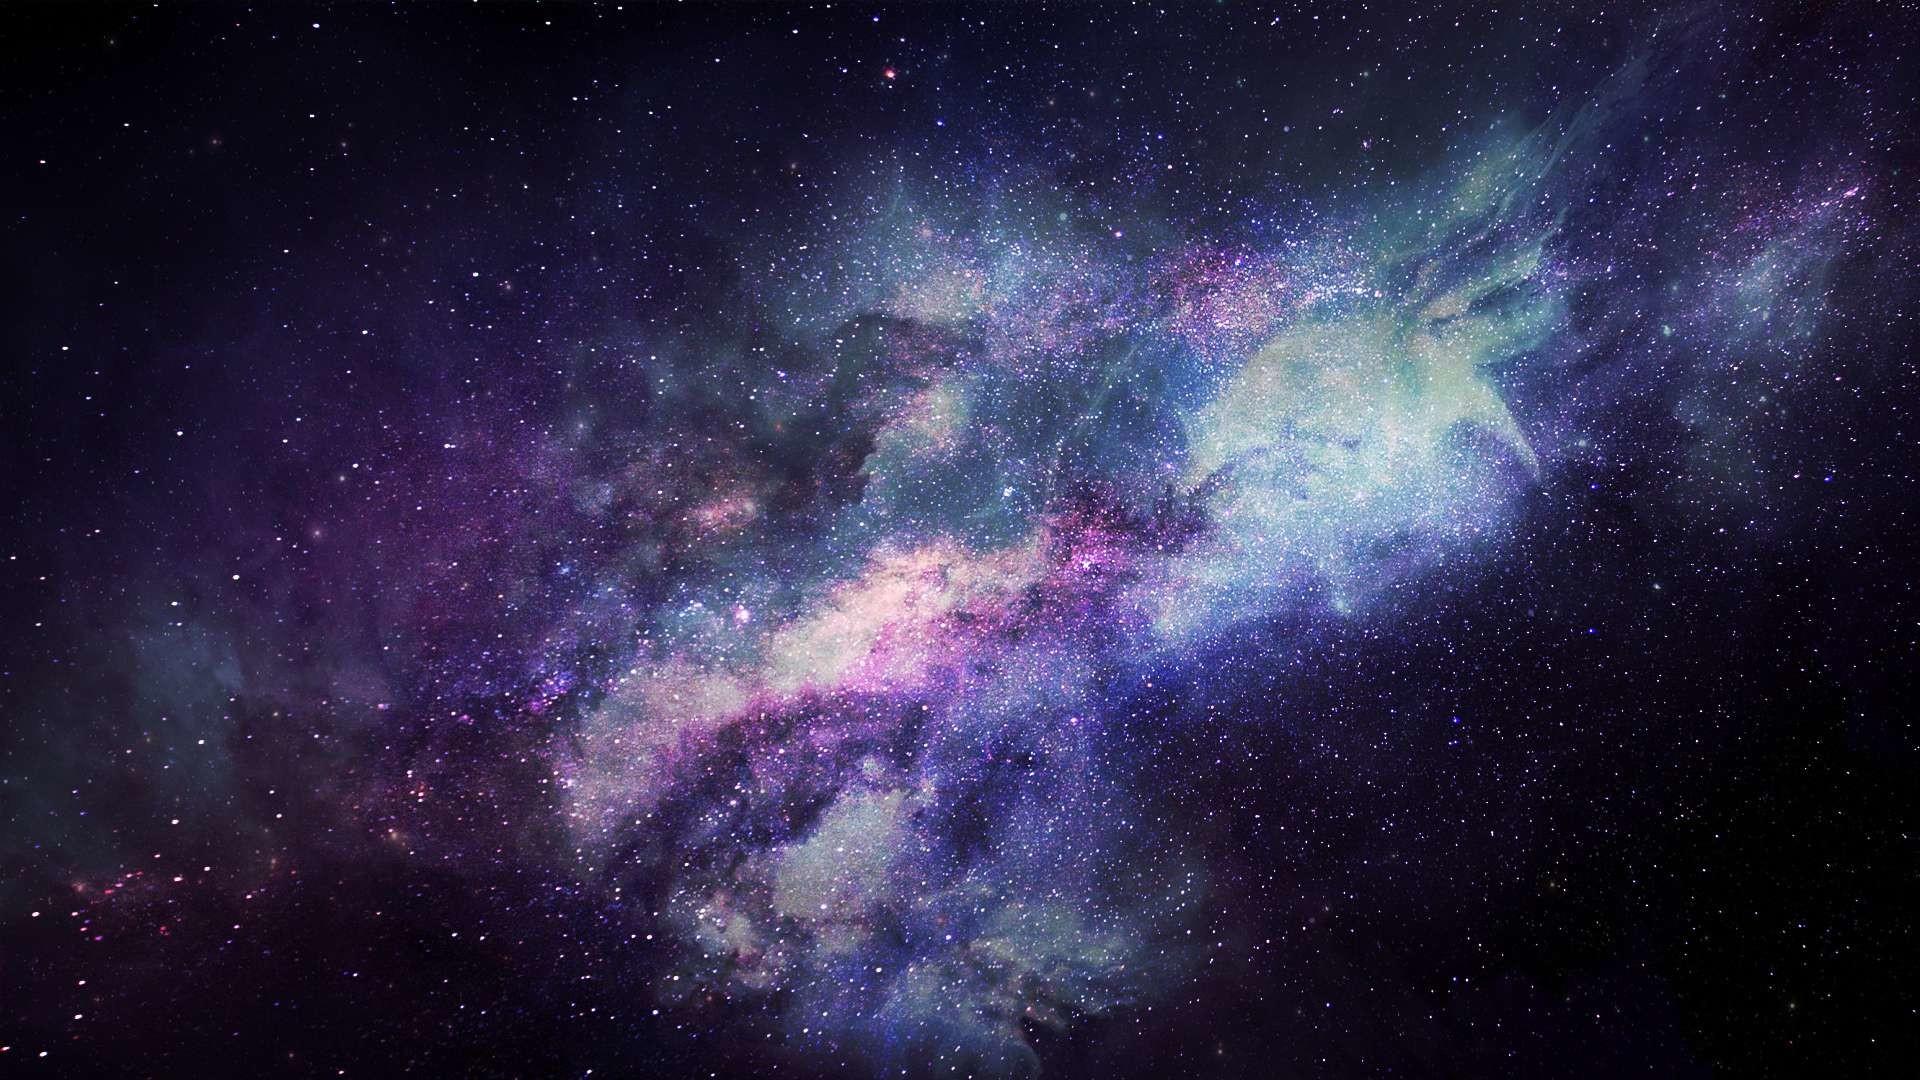 Ultra Hd Space Wallpaper Windows 10